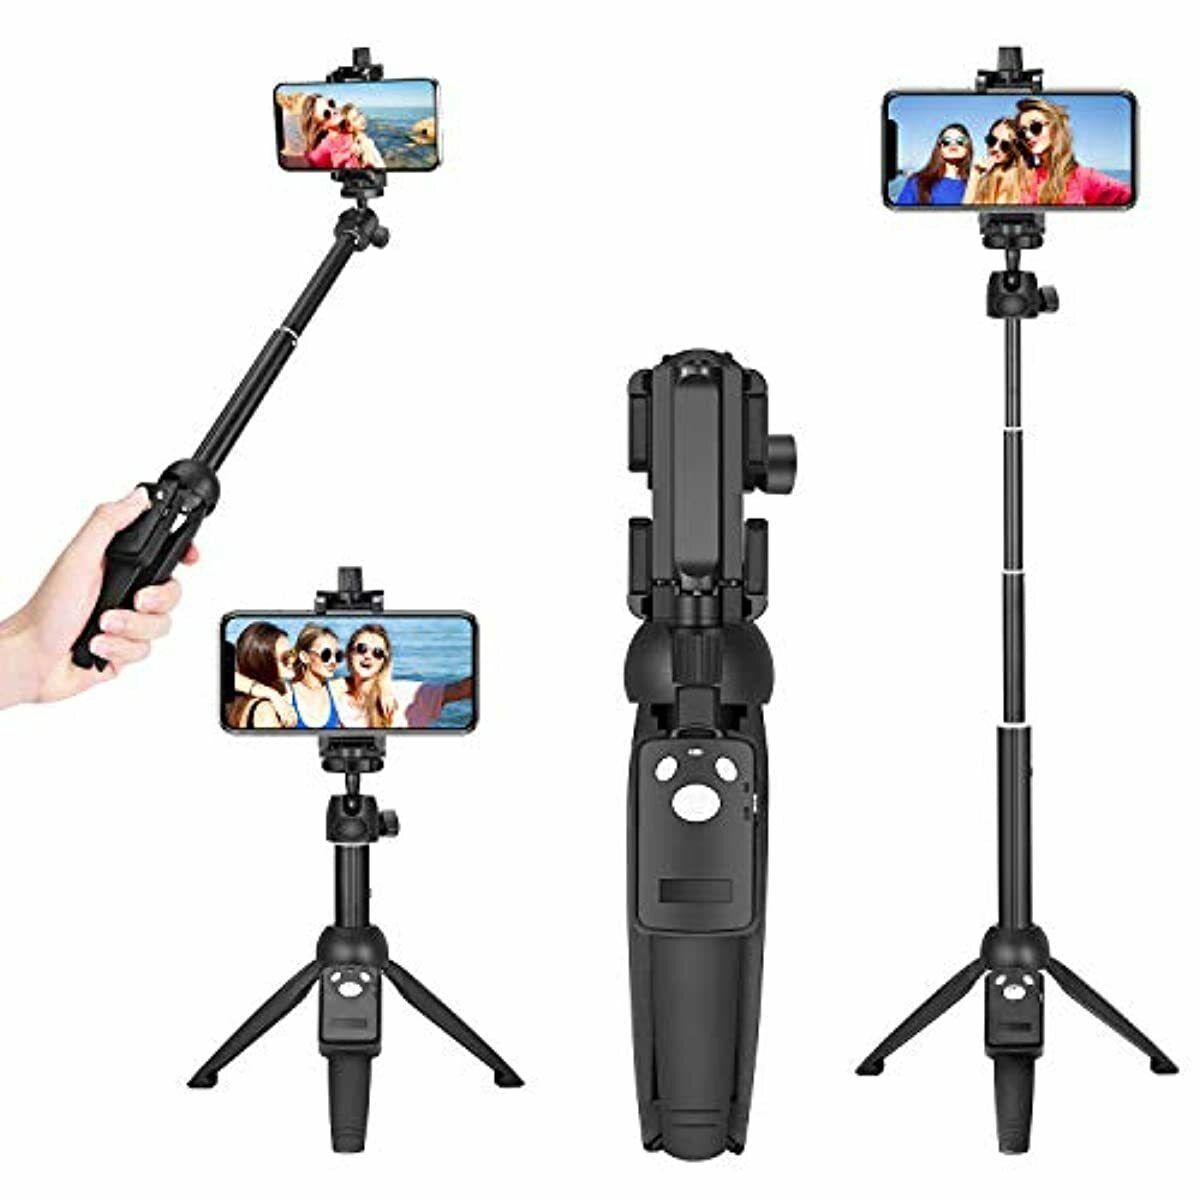 Wevon Selfie Stick, 40 inch Extendable Phone Tripod Stand wi